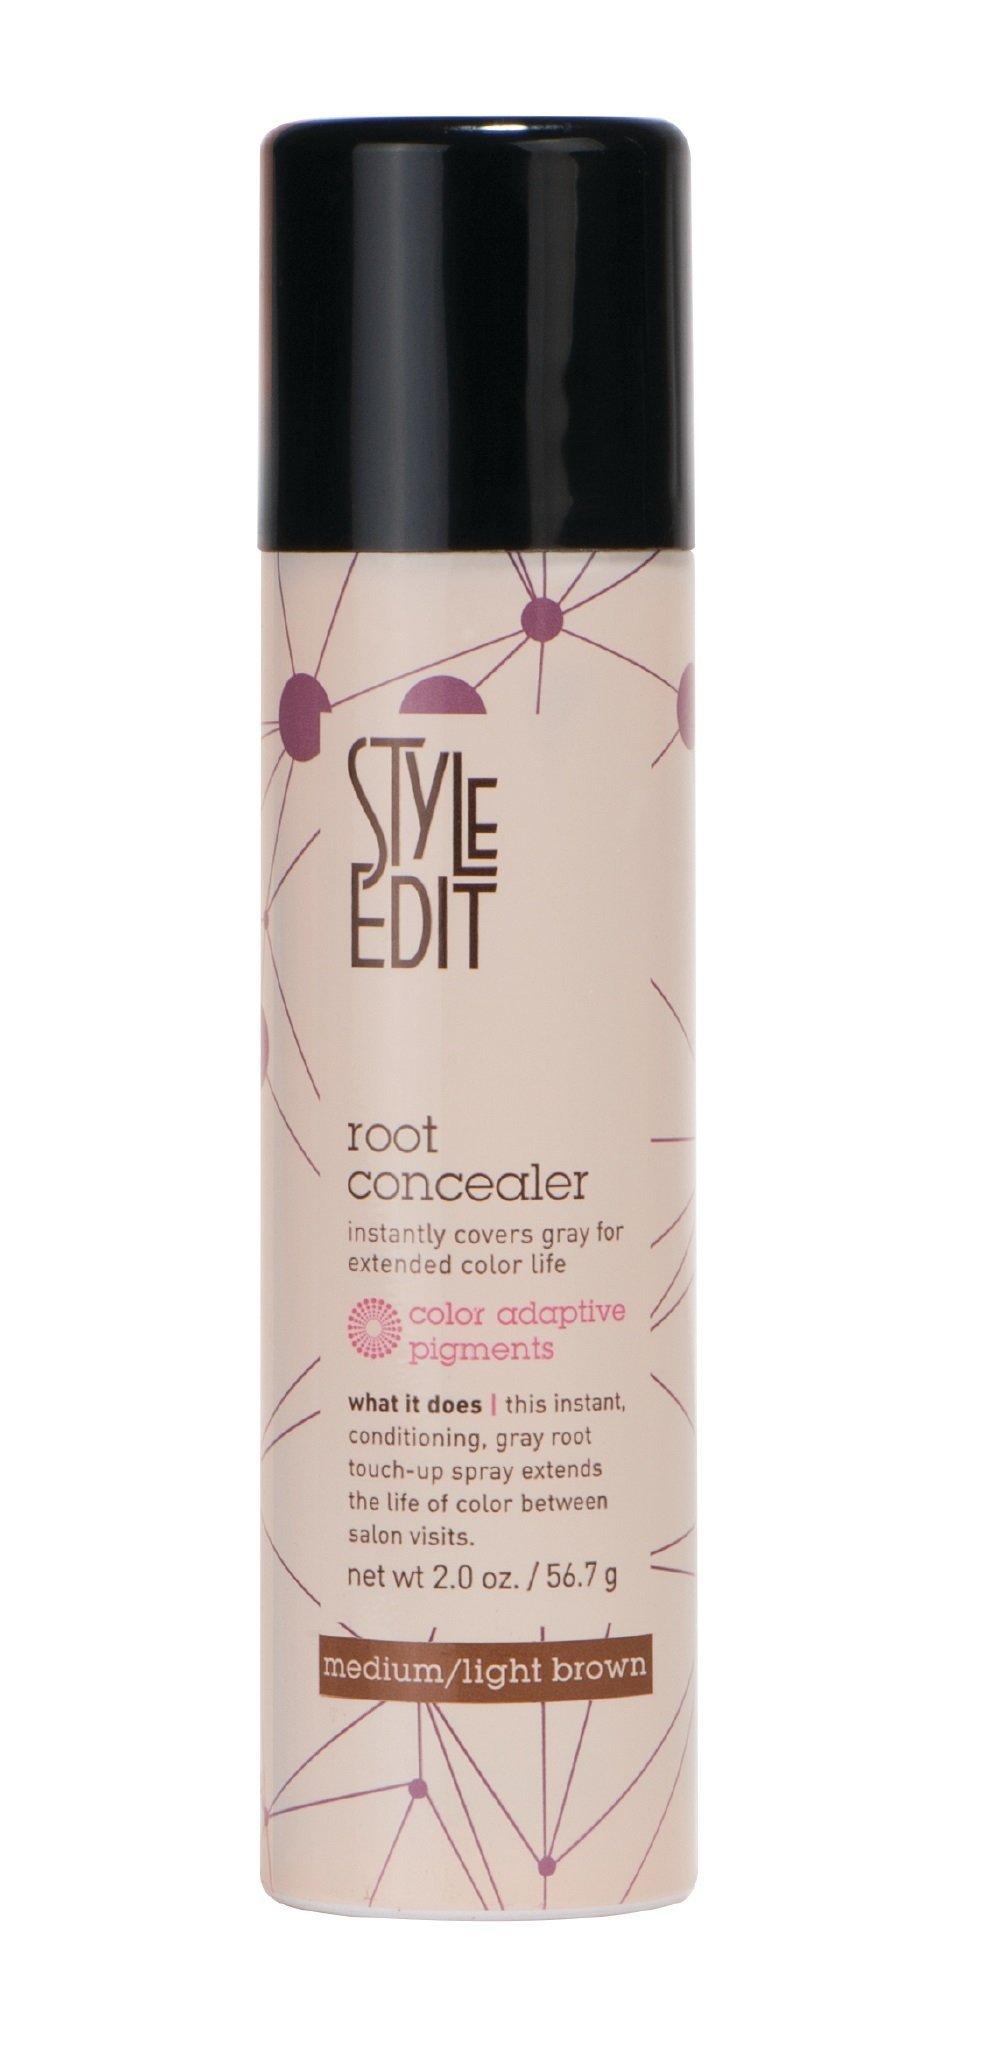 Style Edit Root Concealer Factory Fresh, Brown, Medium/Light, 2 oz.